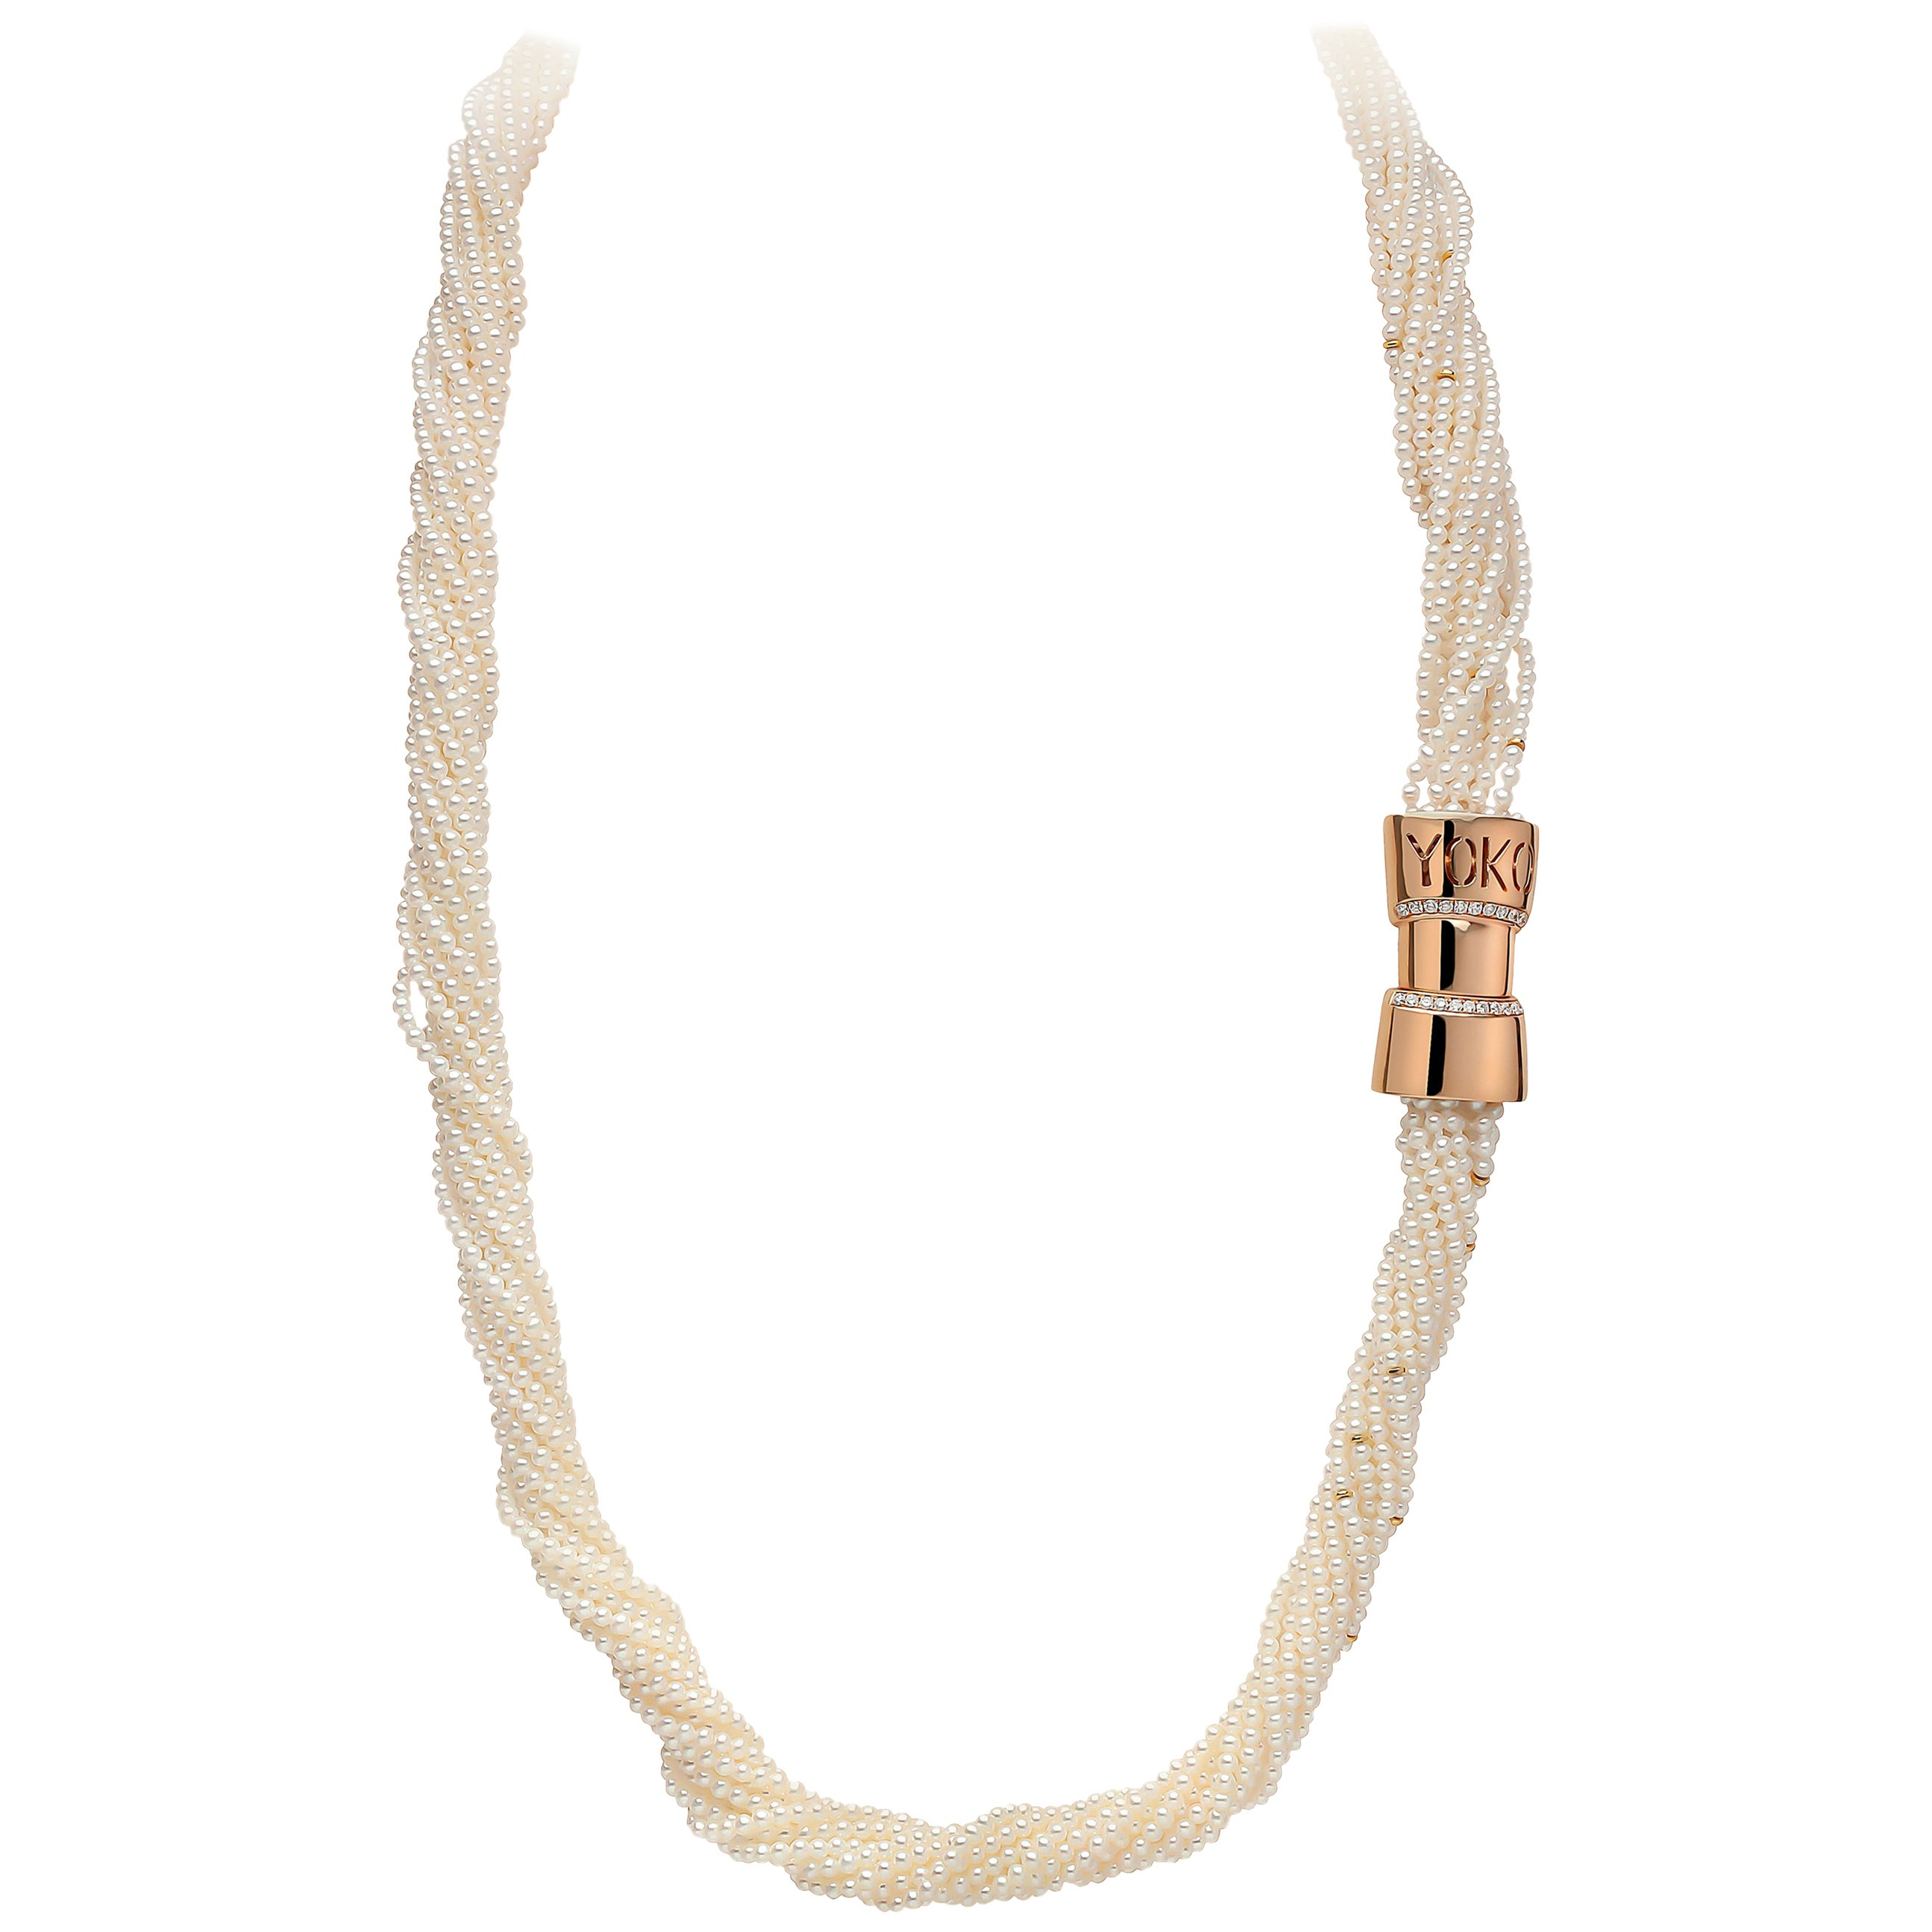 Yoko London Freshwater Pearl and Diamond Necklace in 18 Karat Rose Gold